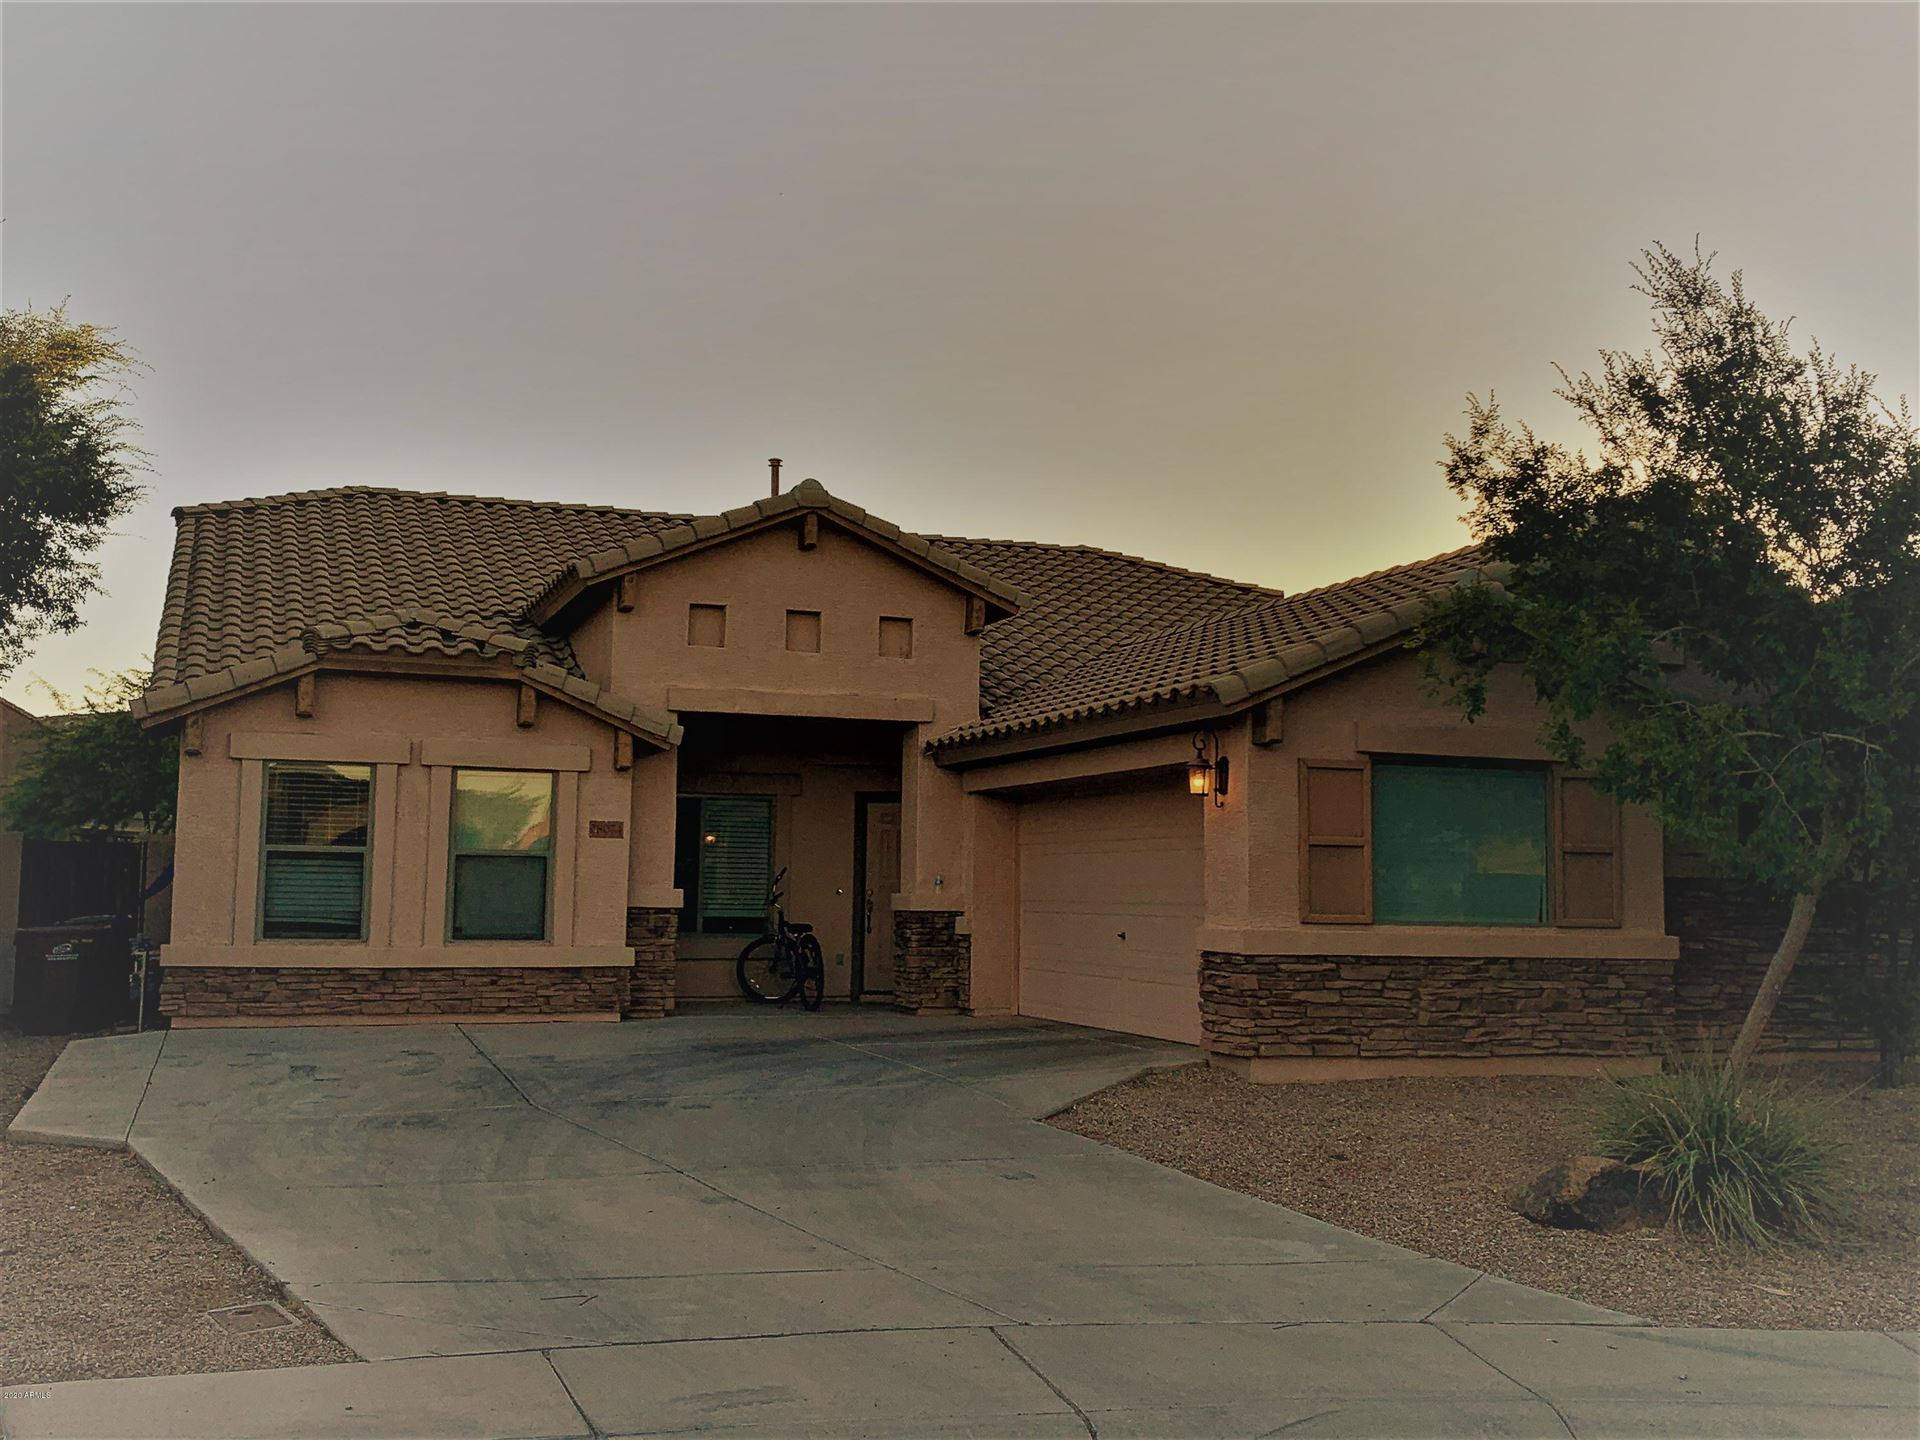 28074 N QUARTZ Circle, San Tan Valley, AZ 85143 - #: 6057545